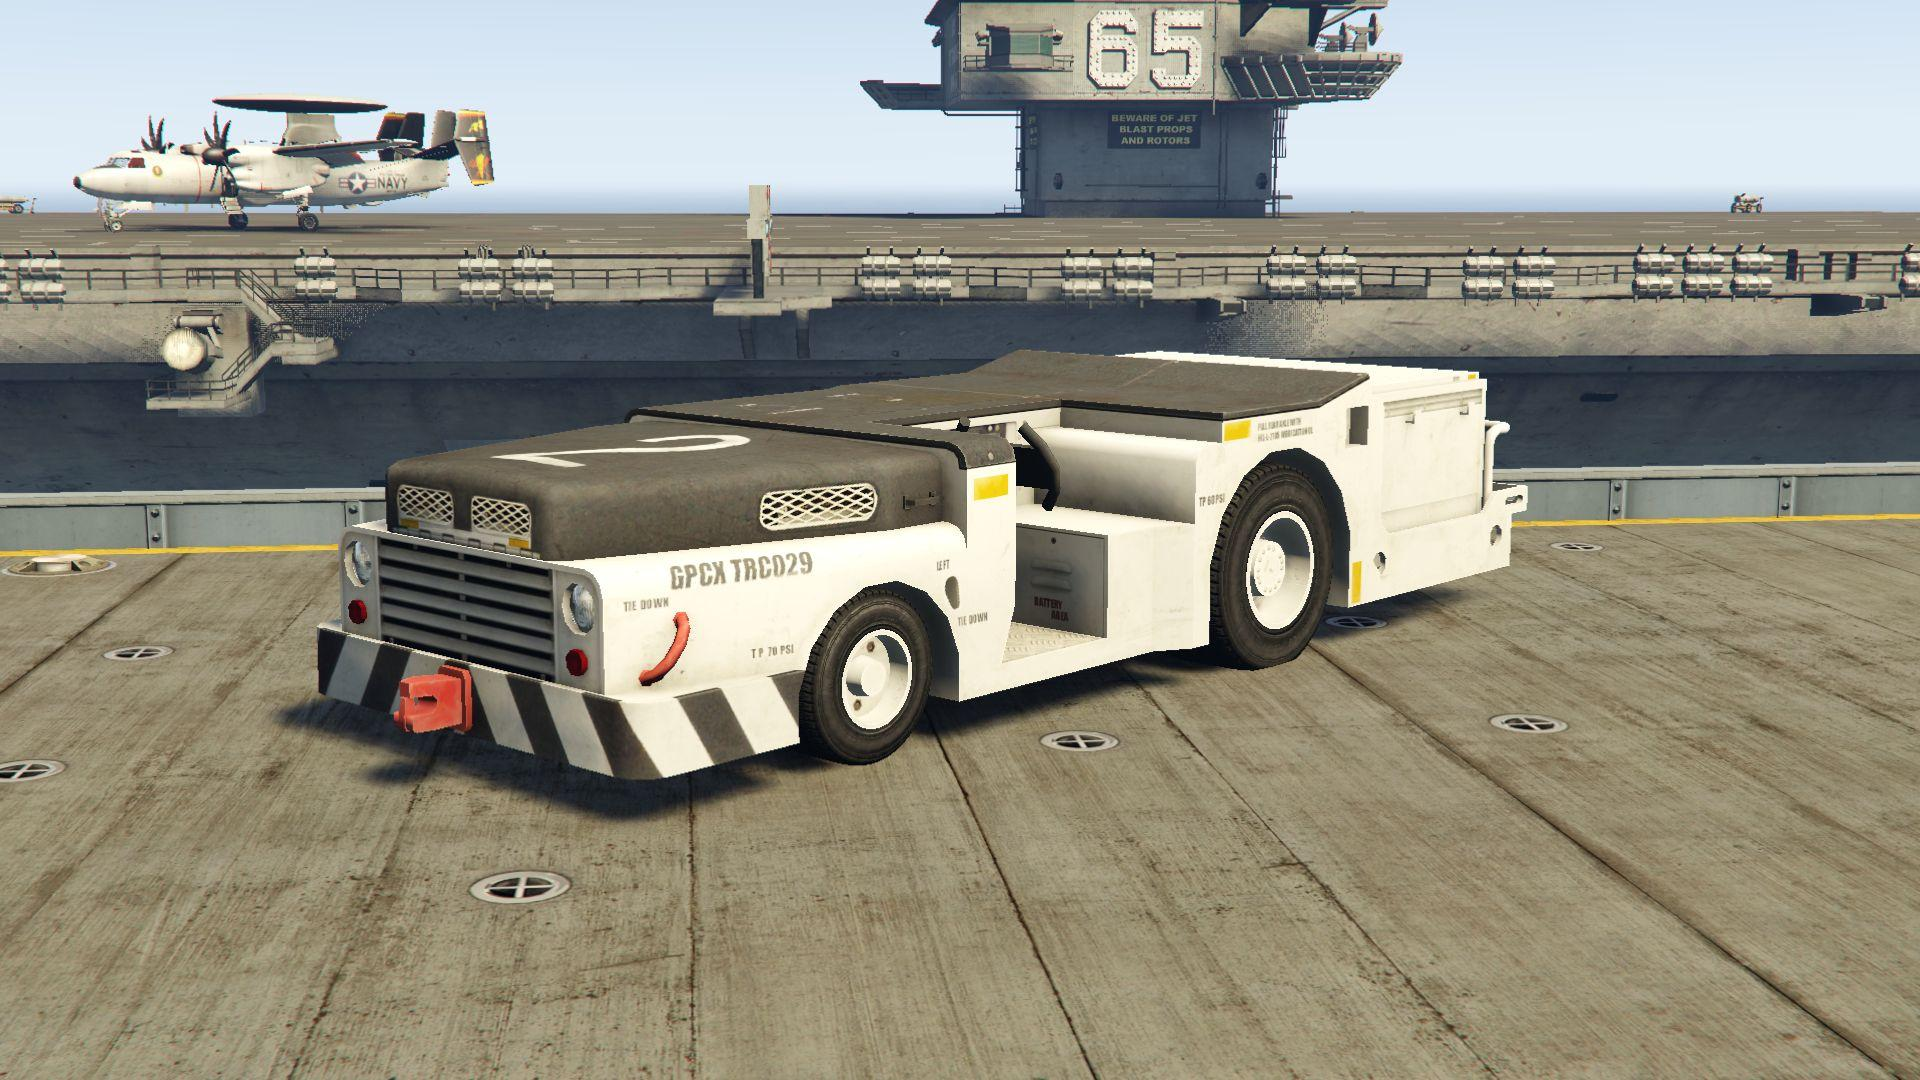 A  S32a-31a Flight Deck Tractor